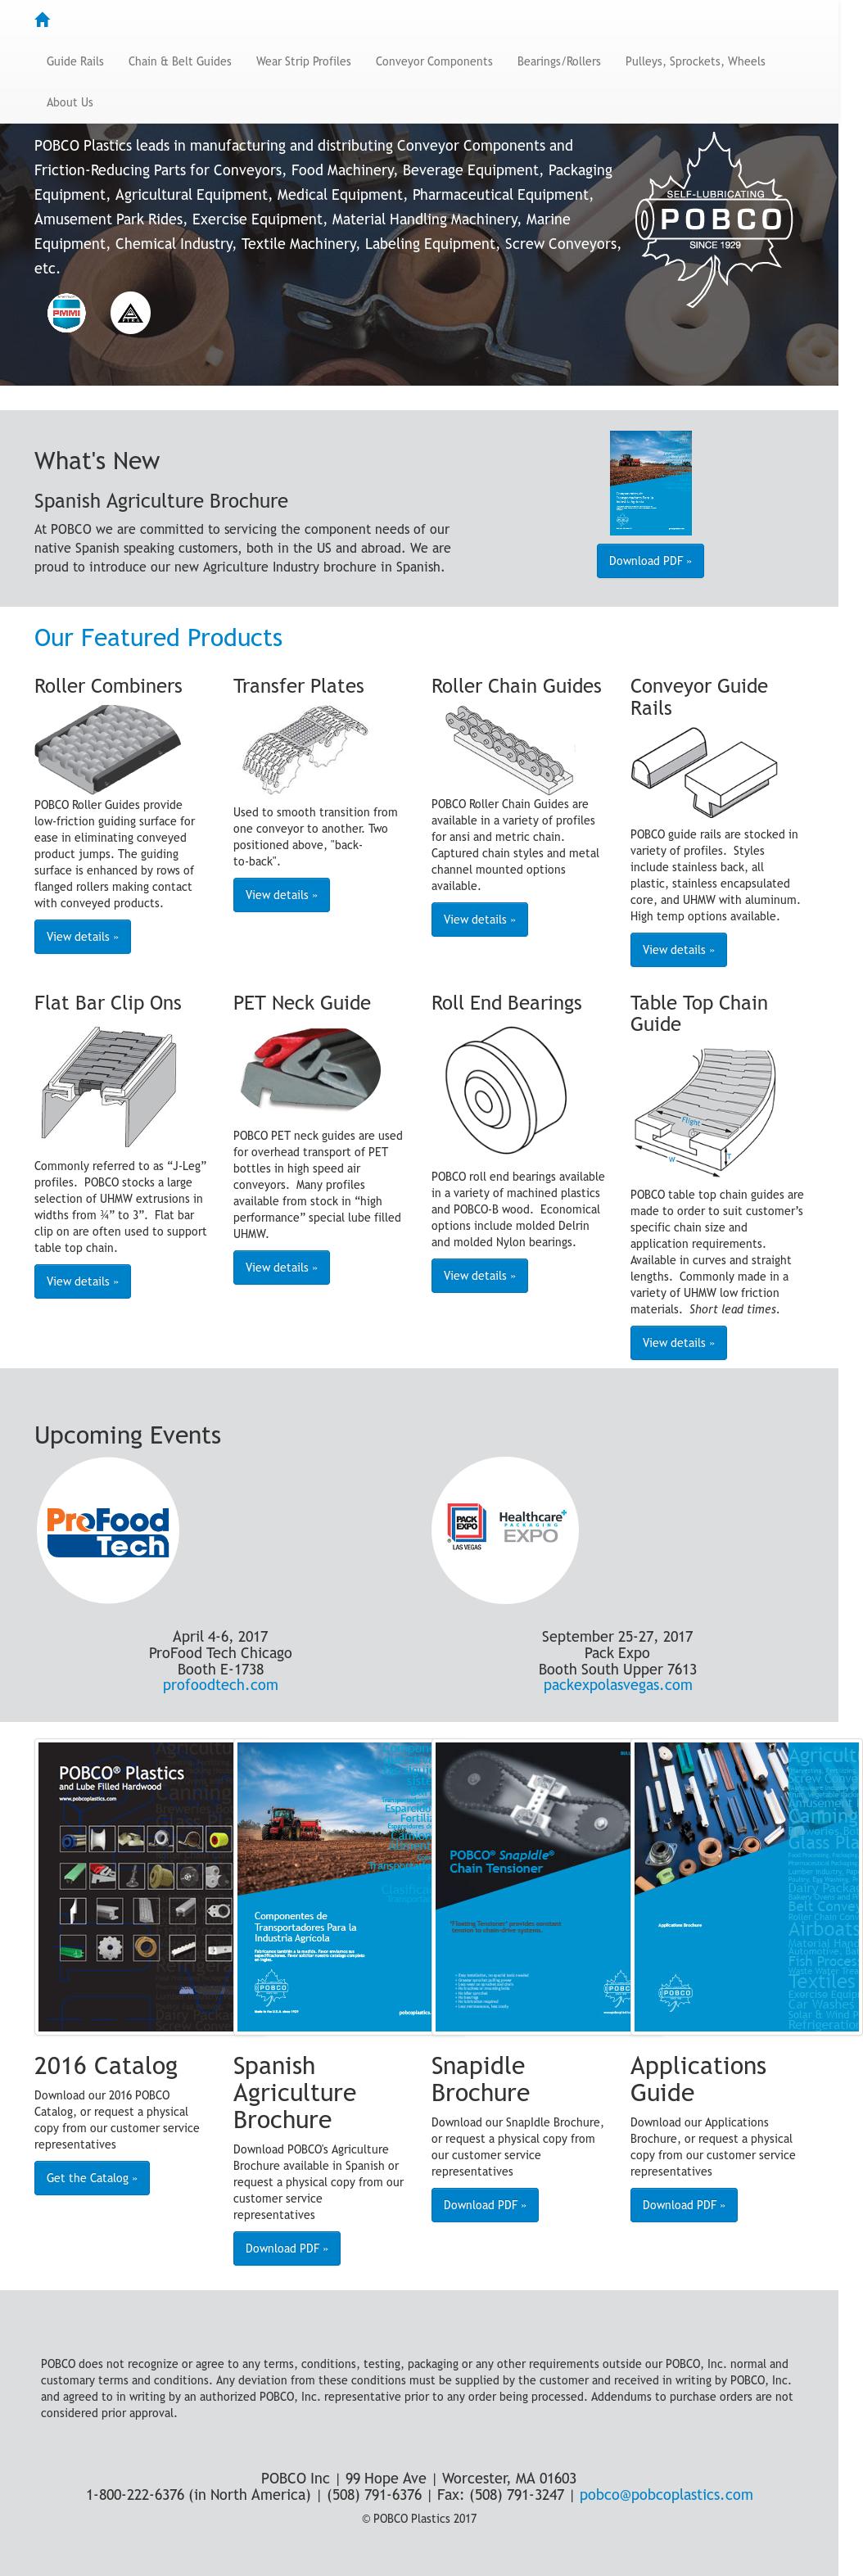 Pobco Competitors, Revenue and Employees - Owler Company Profile